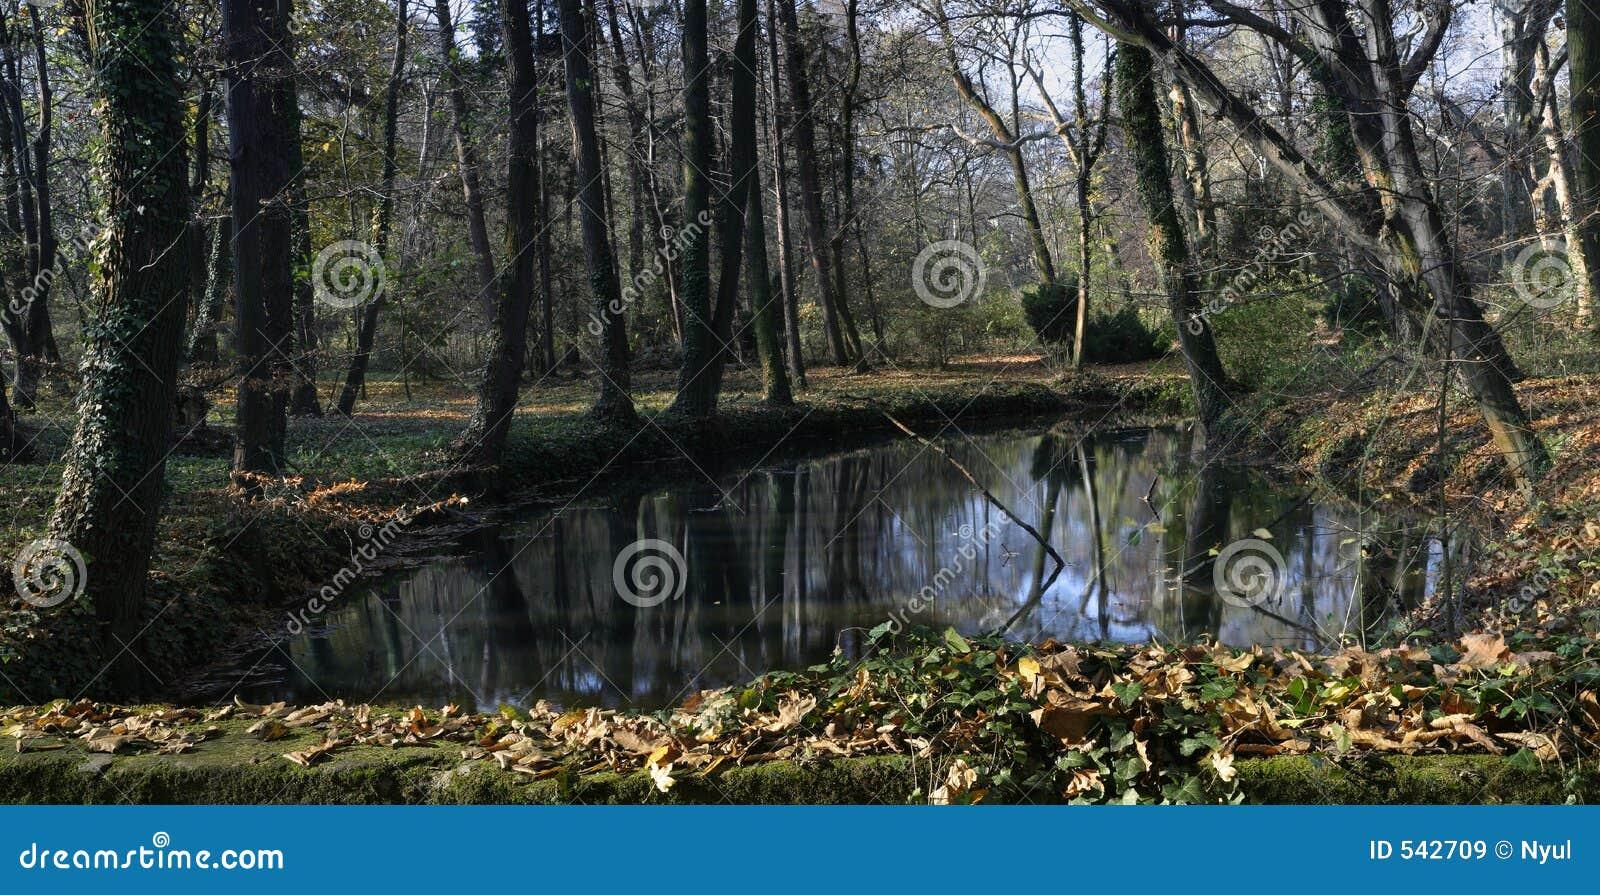 Download 和平 库存图片. 图片 包括有 结构树, 自治权, 重新创建, 森林, 青苔, 小河, 沈默, 静音, 路径 - 542709